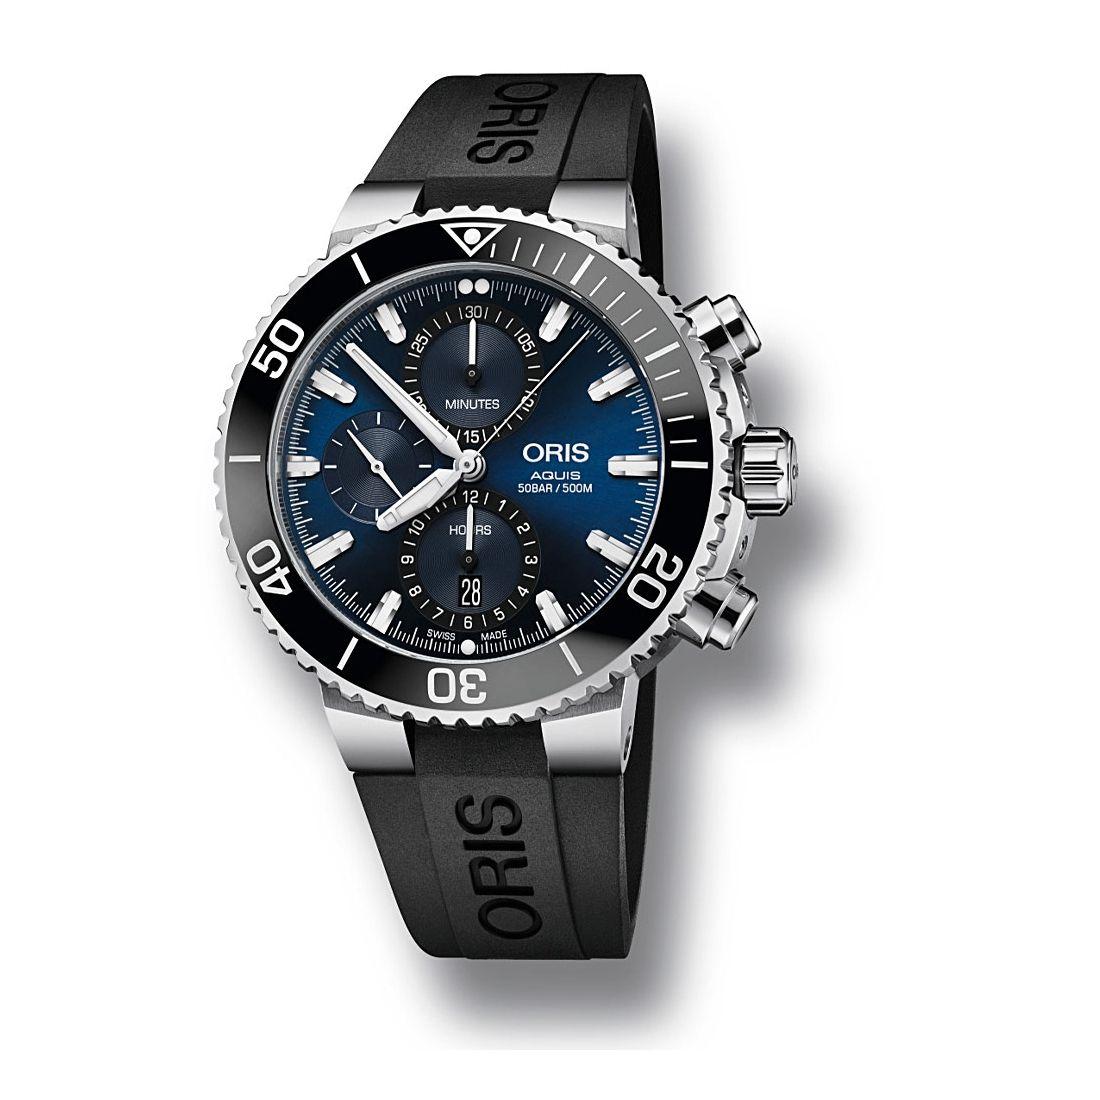 Reloj Oris Aquis Chronograph - 01 774 7743 4155-07 4 24 64EB  - 1